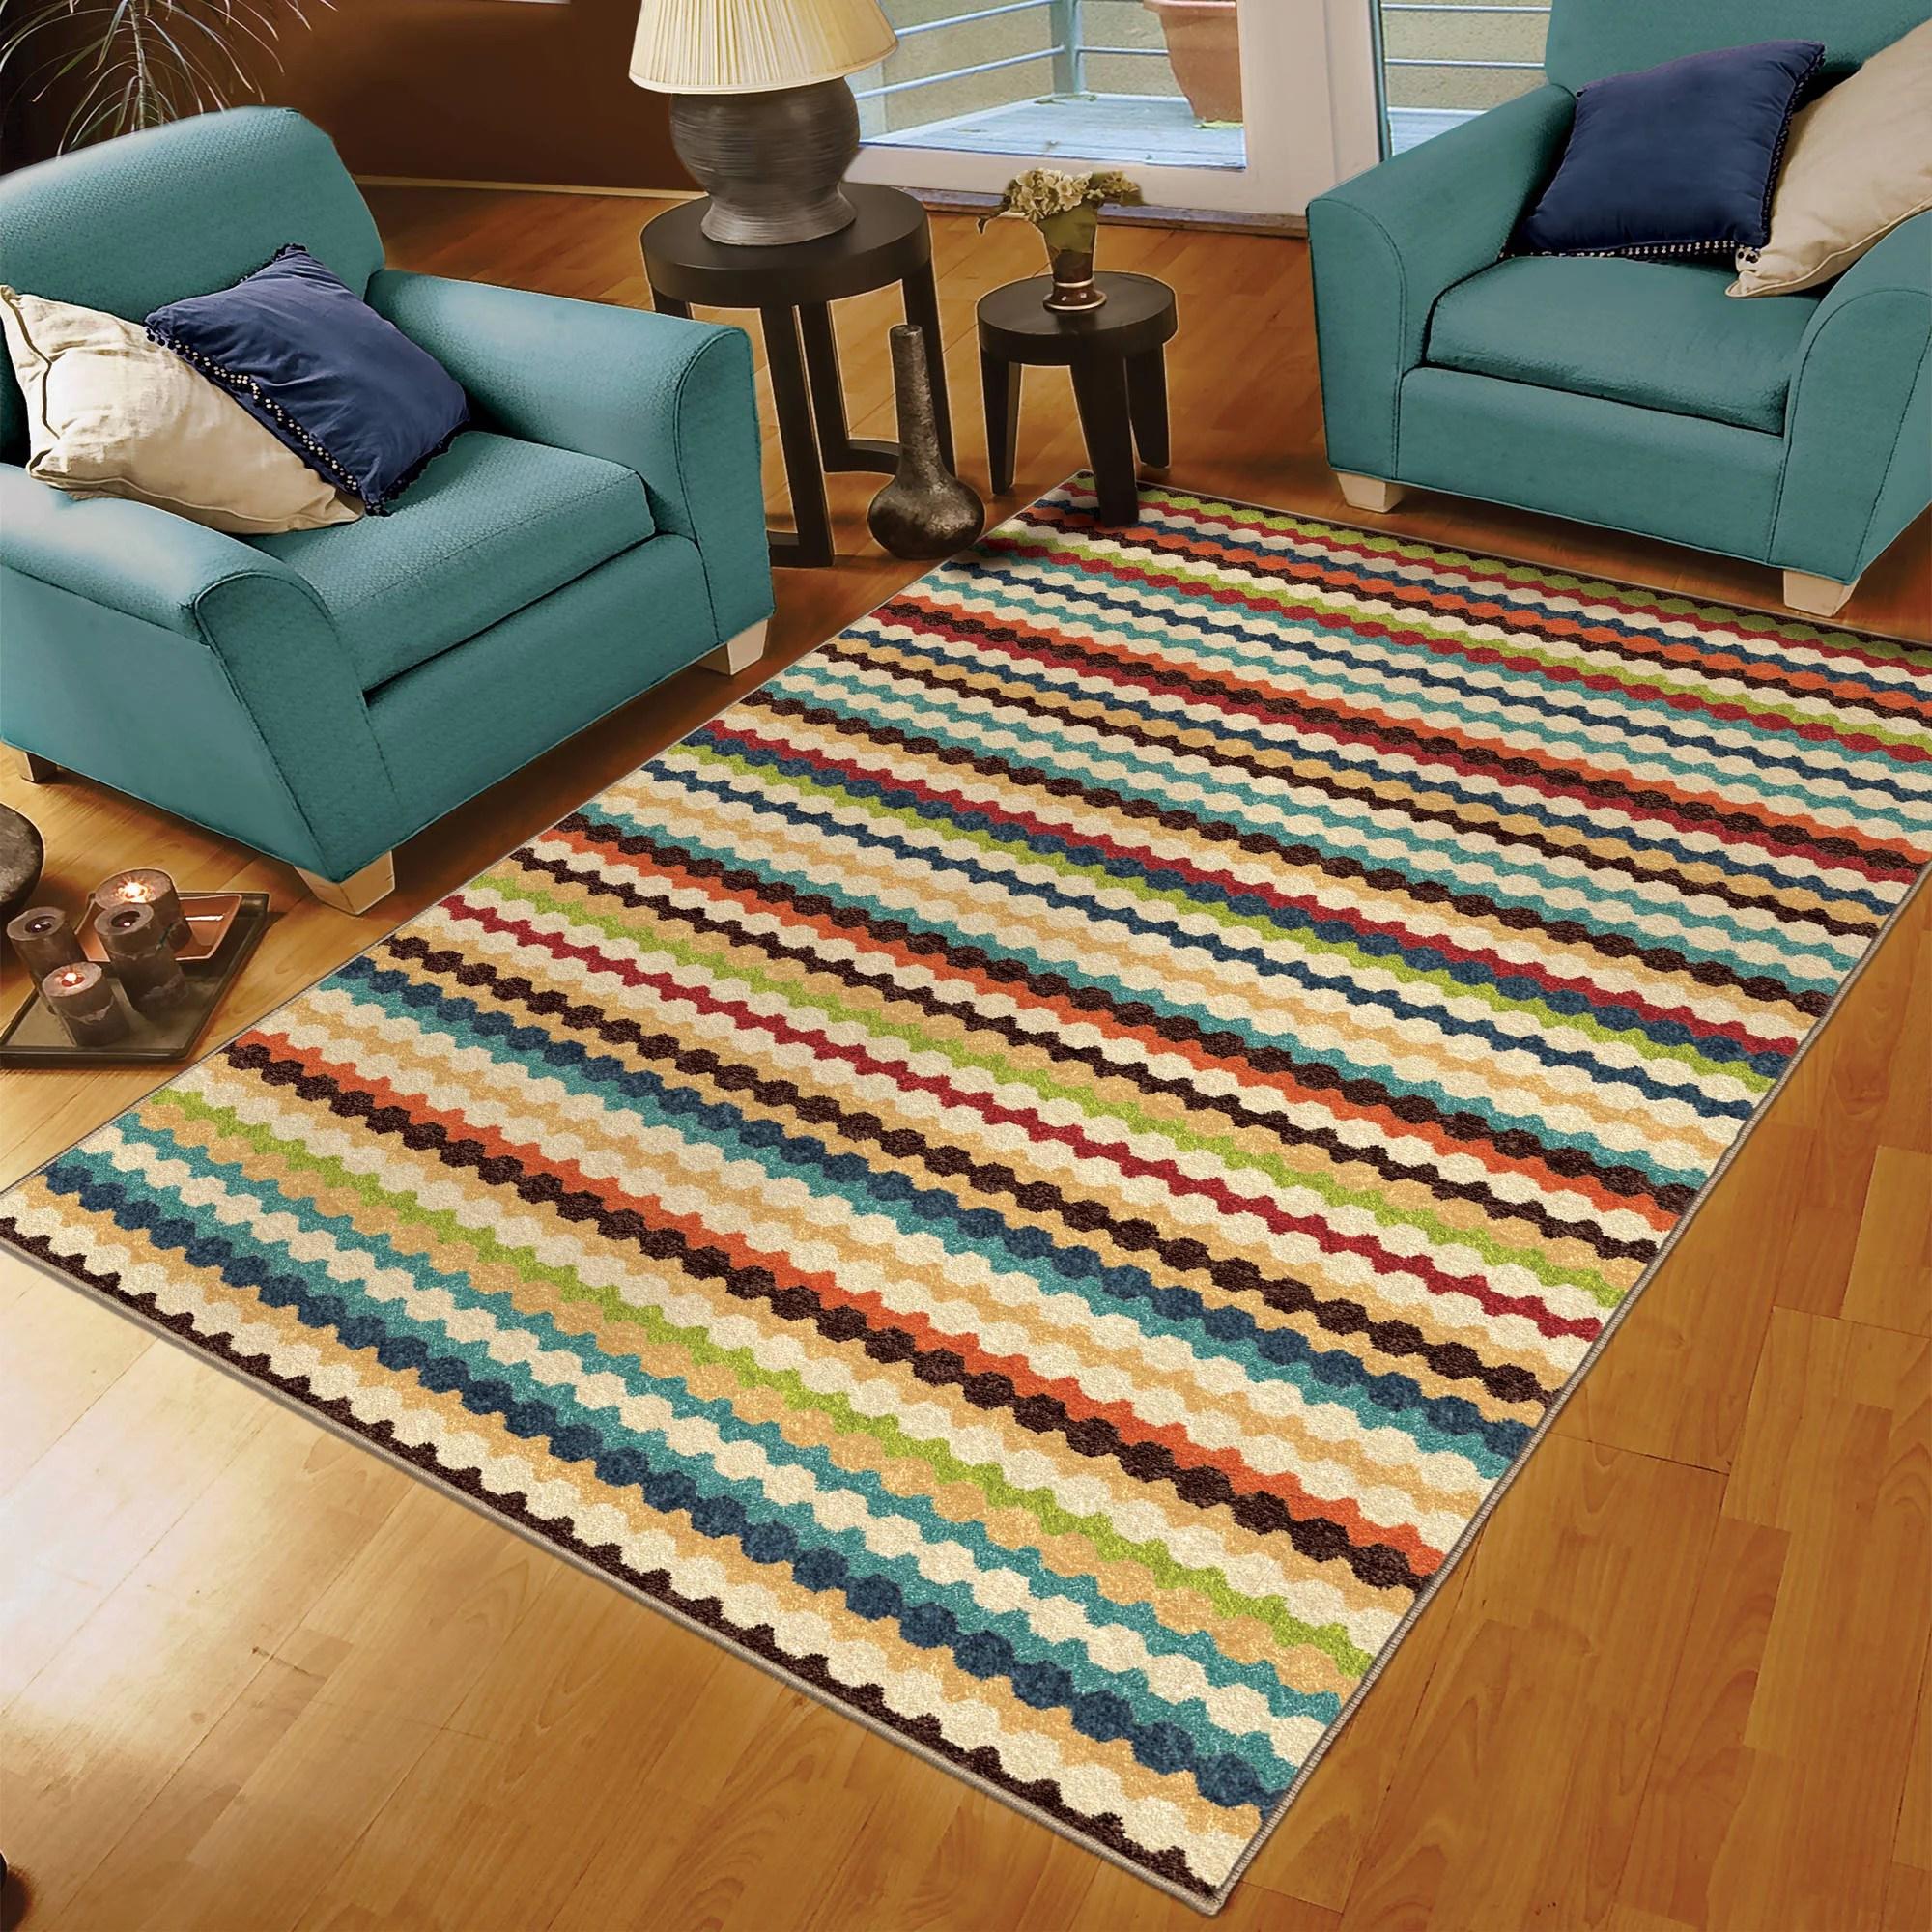 kitchen floor mats walmart 2 3 Rugs